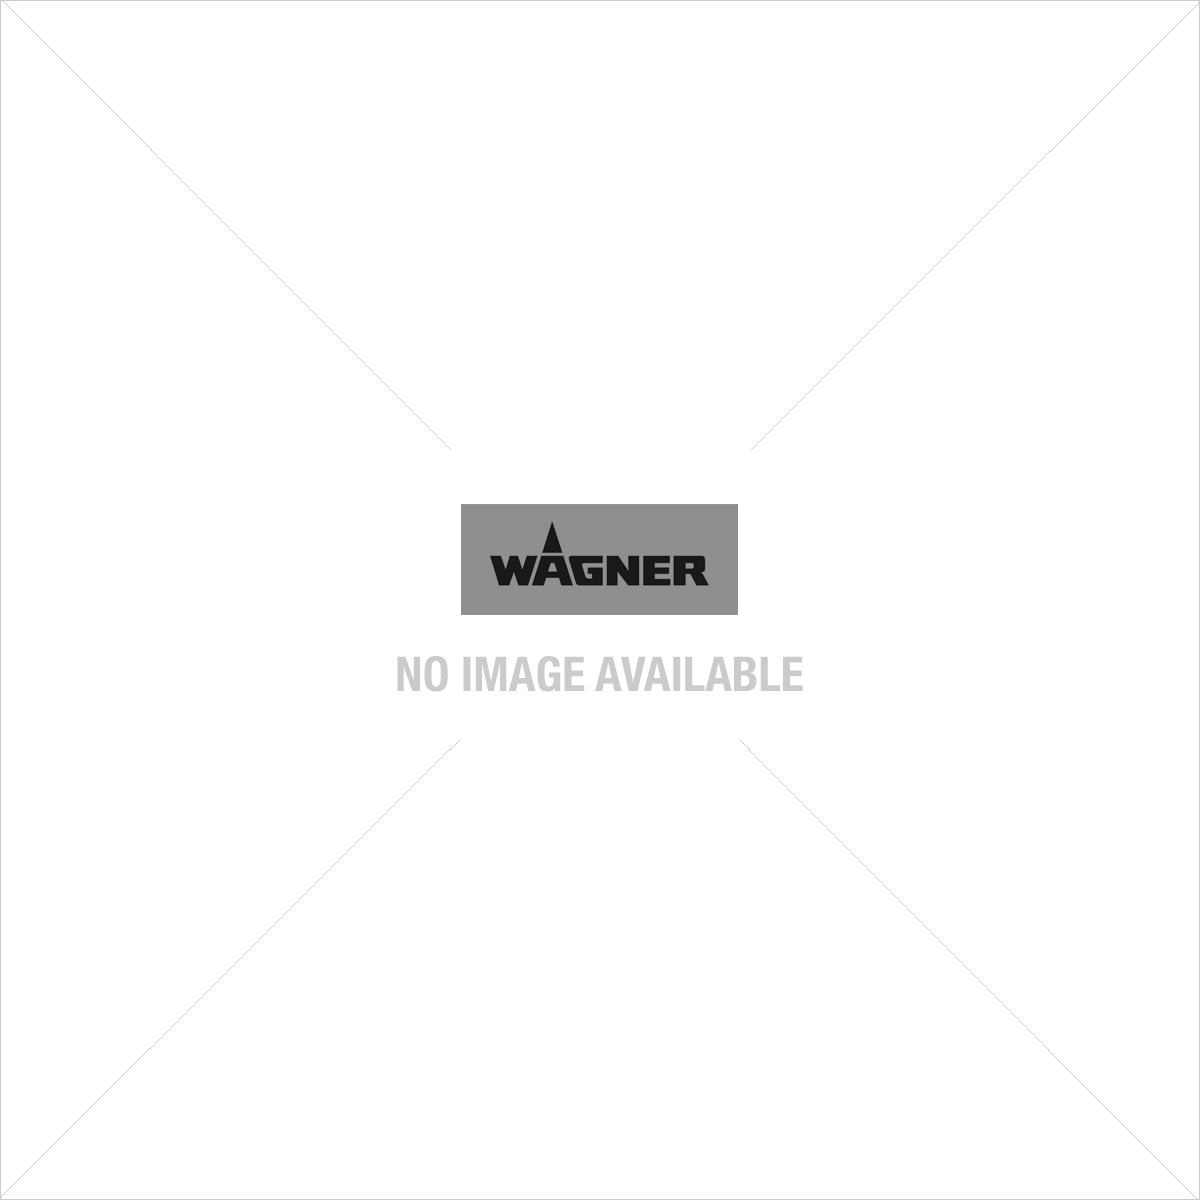 Wagner Power Painter 90 Airless paint sprayer